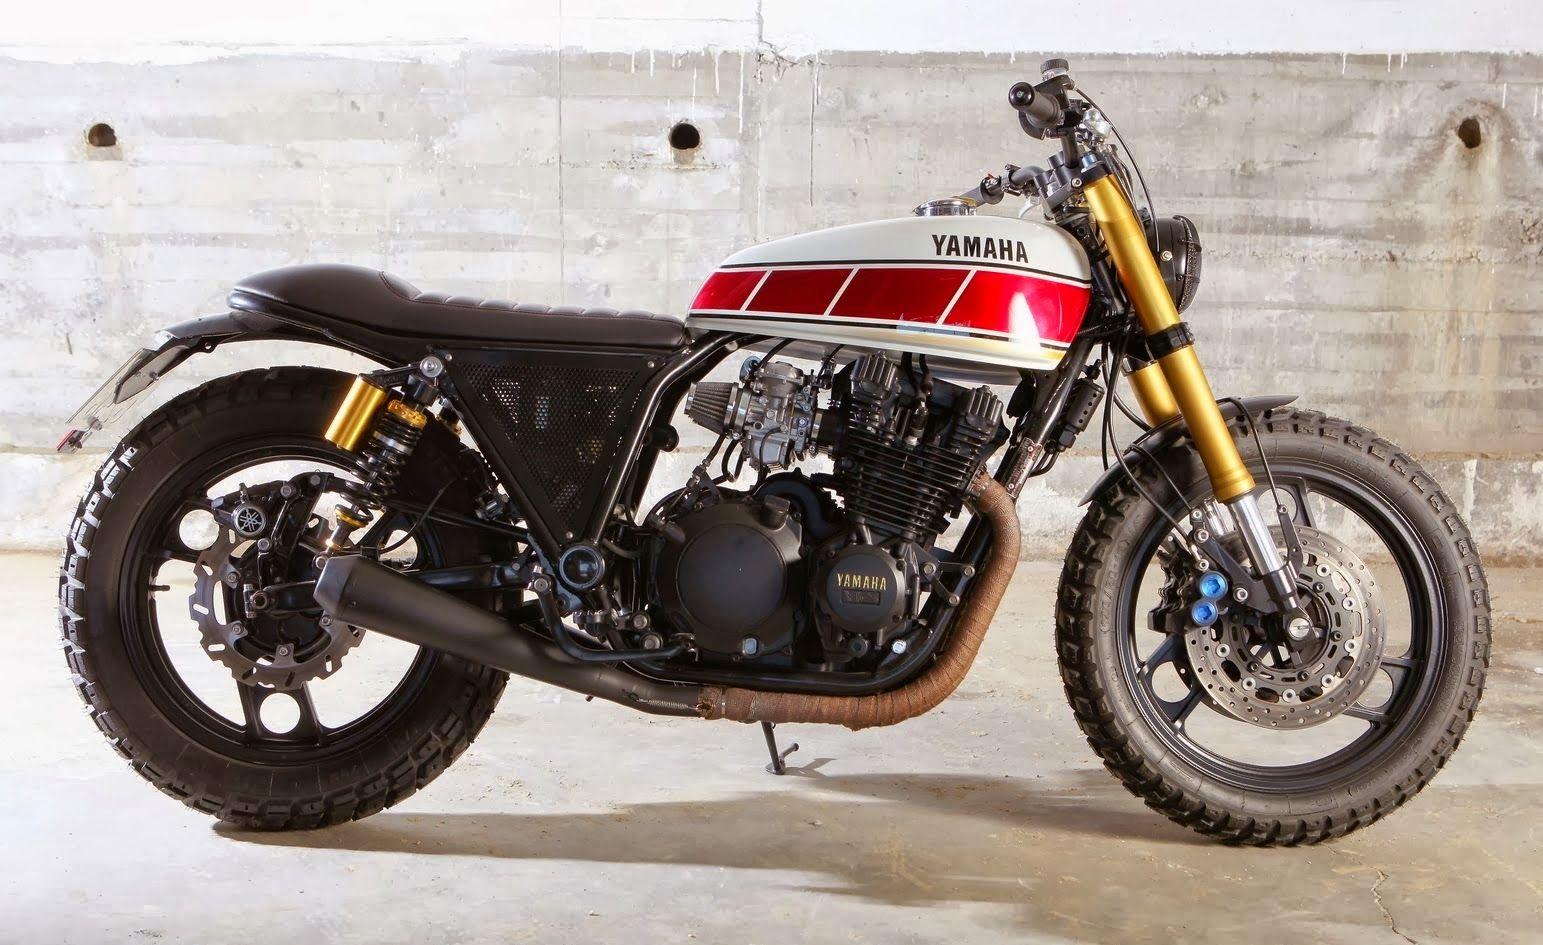 MOTOCICLETTE, MEMORABILIA ED ALTRO ANCORA: Yamaha XJ 900 by Tarmac Custom Motorcyclrs